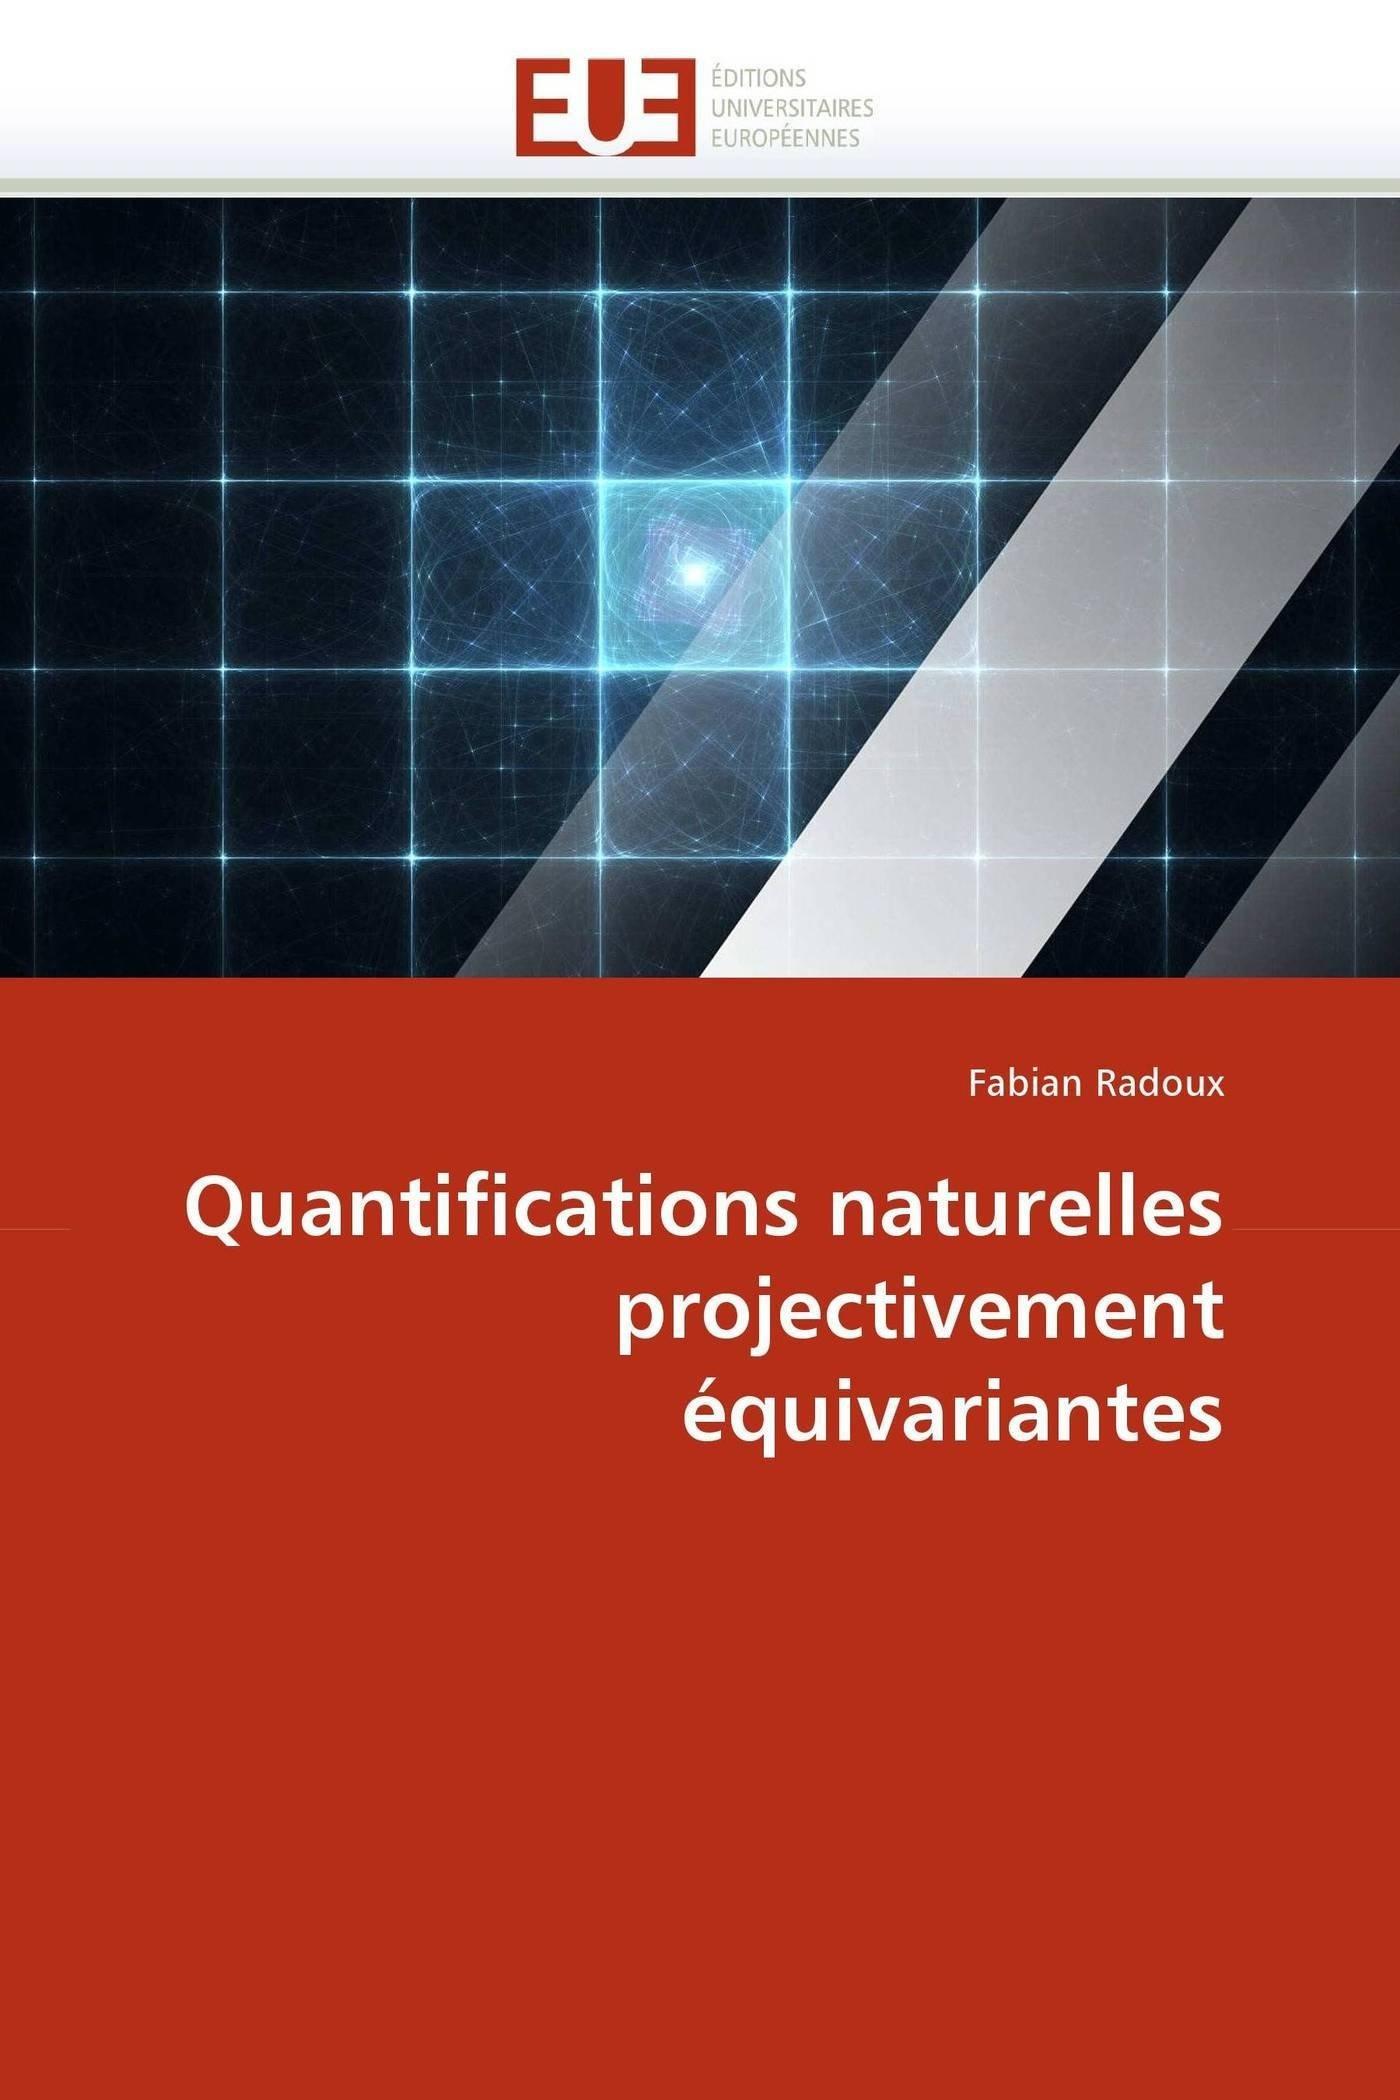 Download Quantifications naturelles projectivement équivariantes (Omn.Univ.Europ.) (French Edition) pdf epub